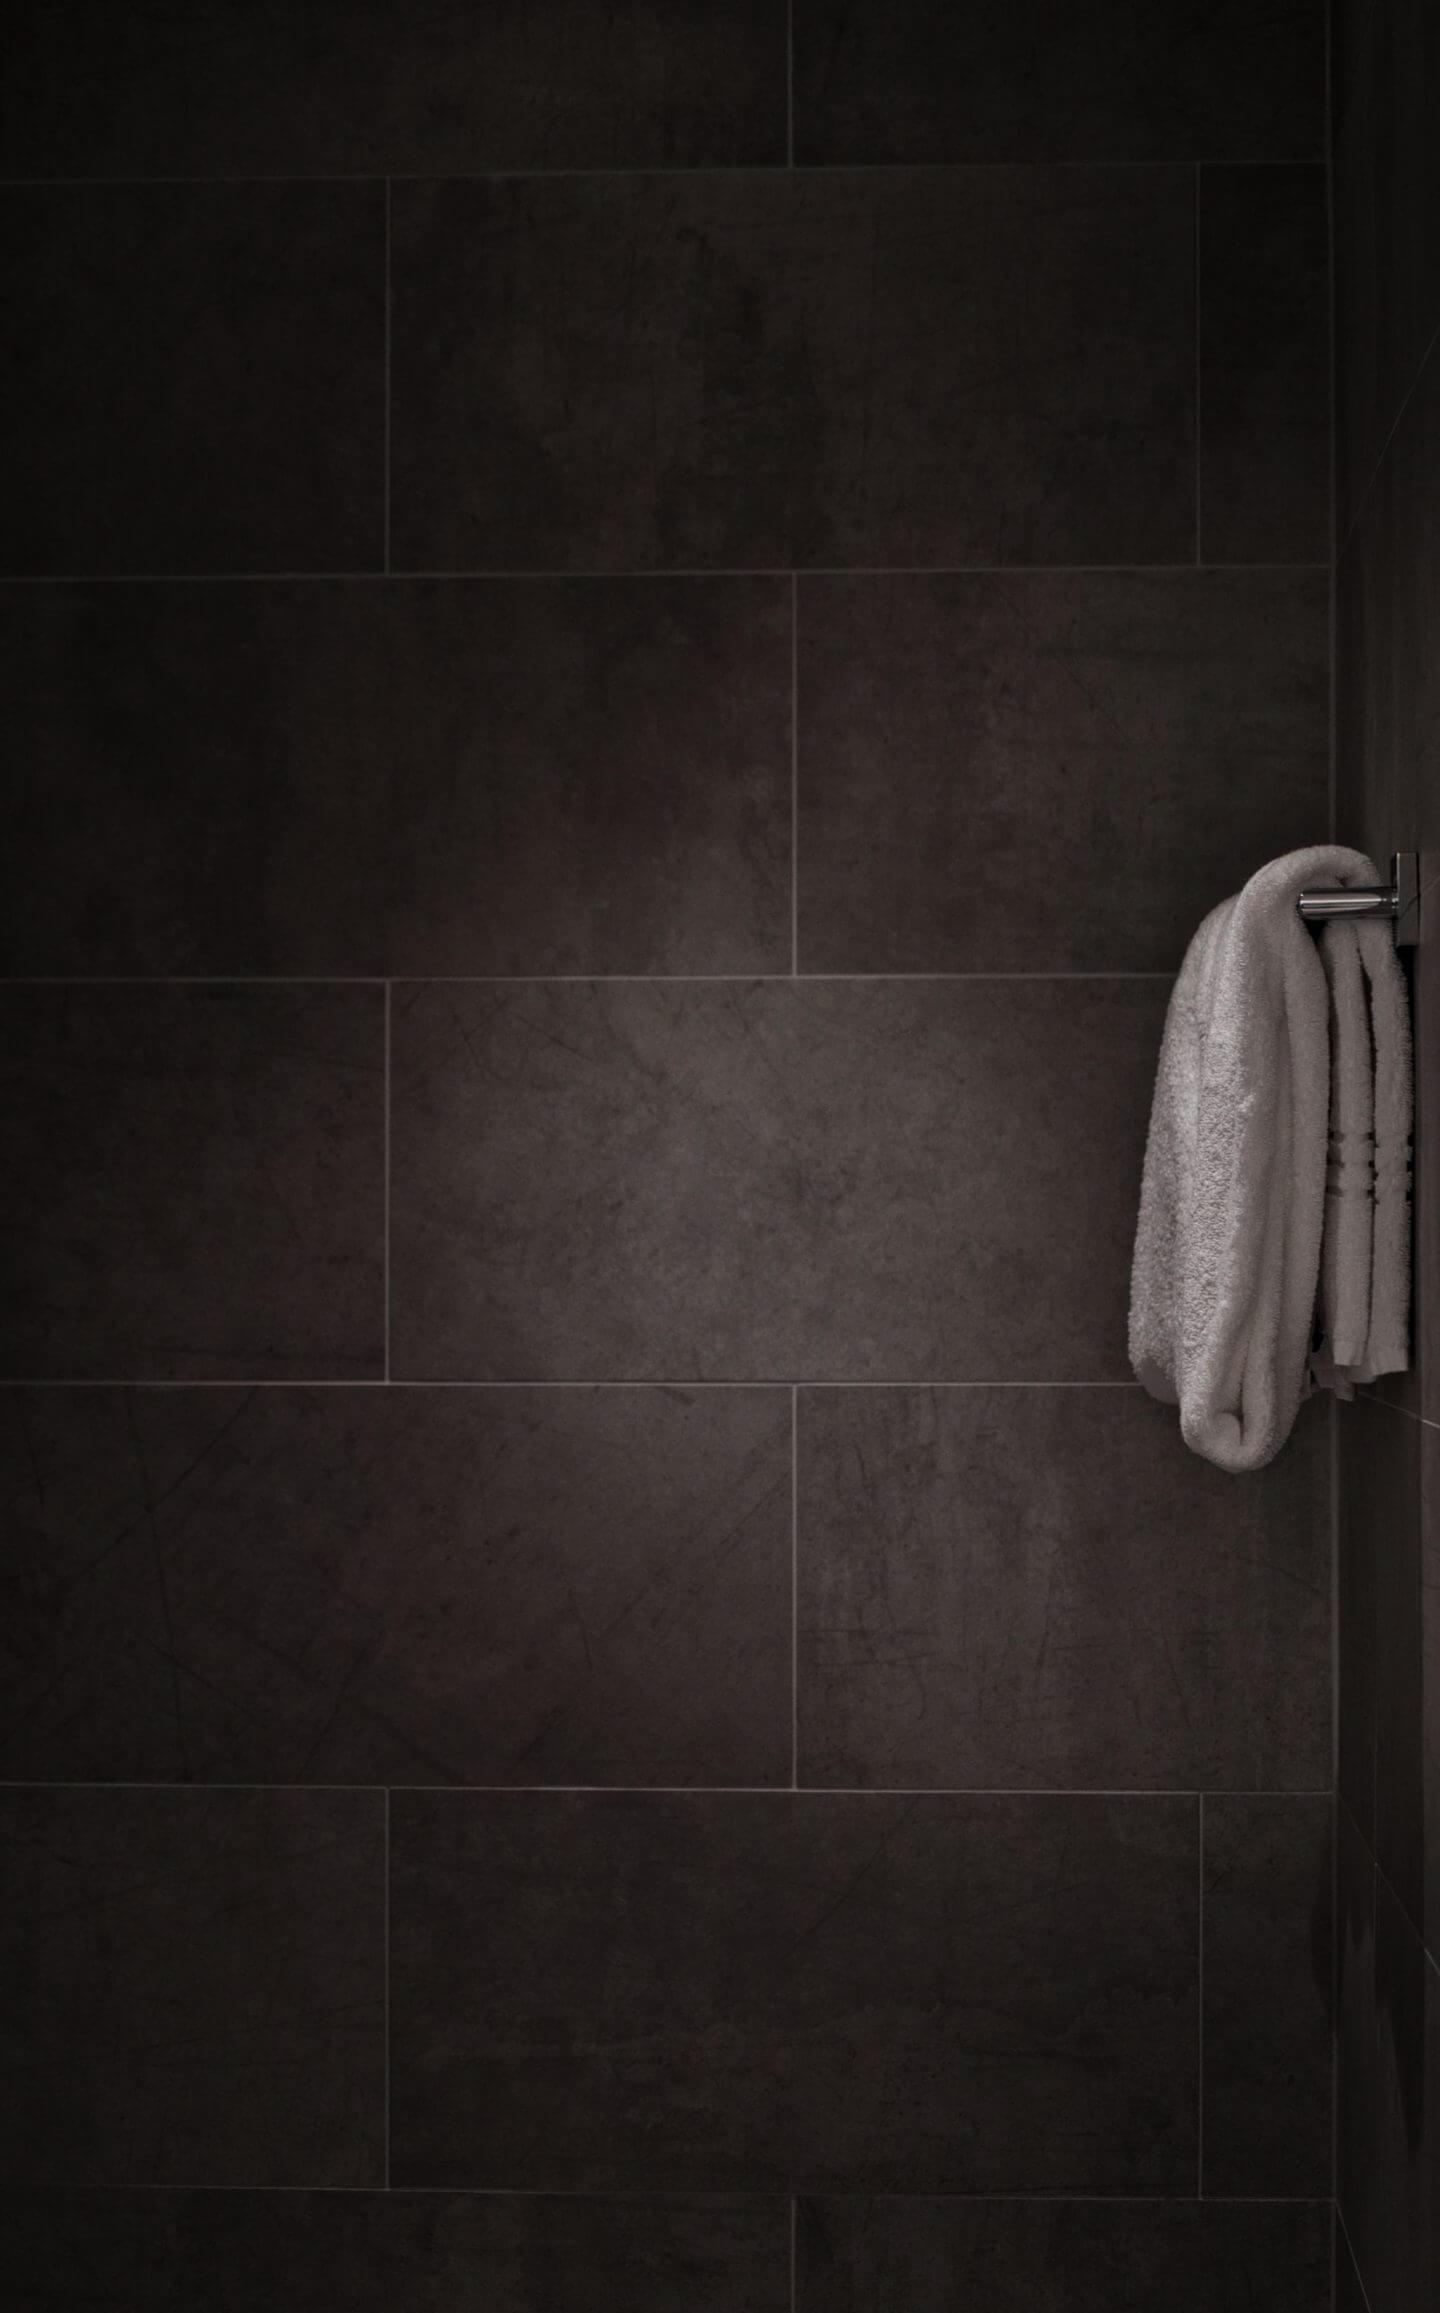 black bathroom tiles with white towel